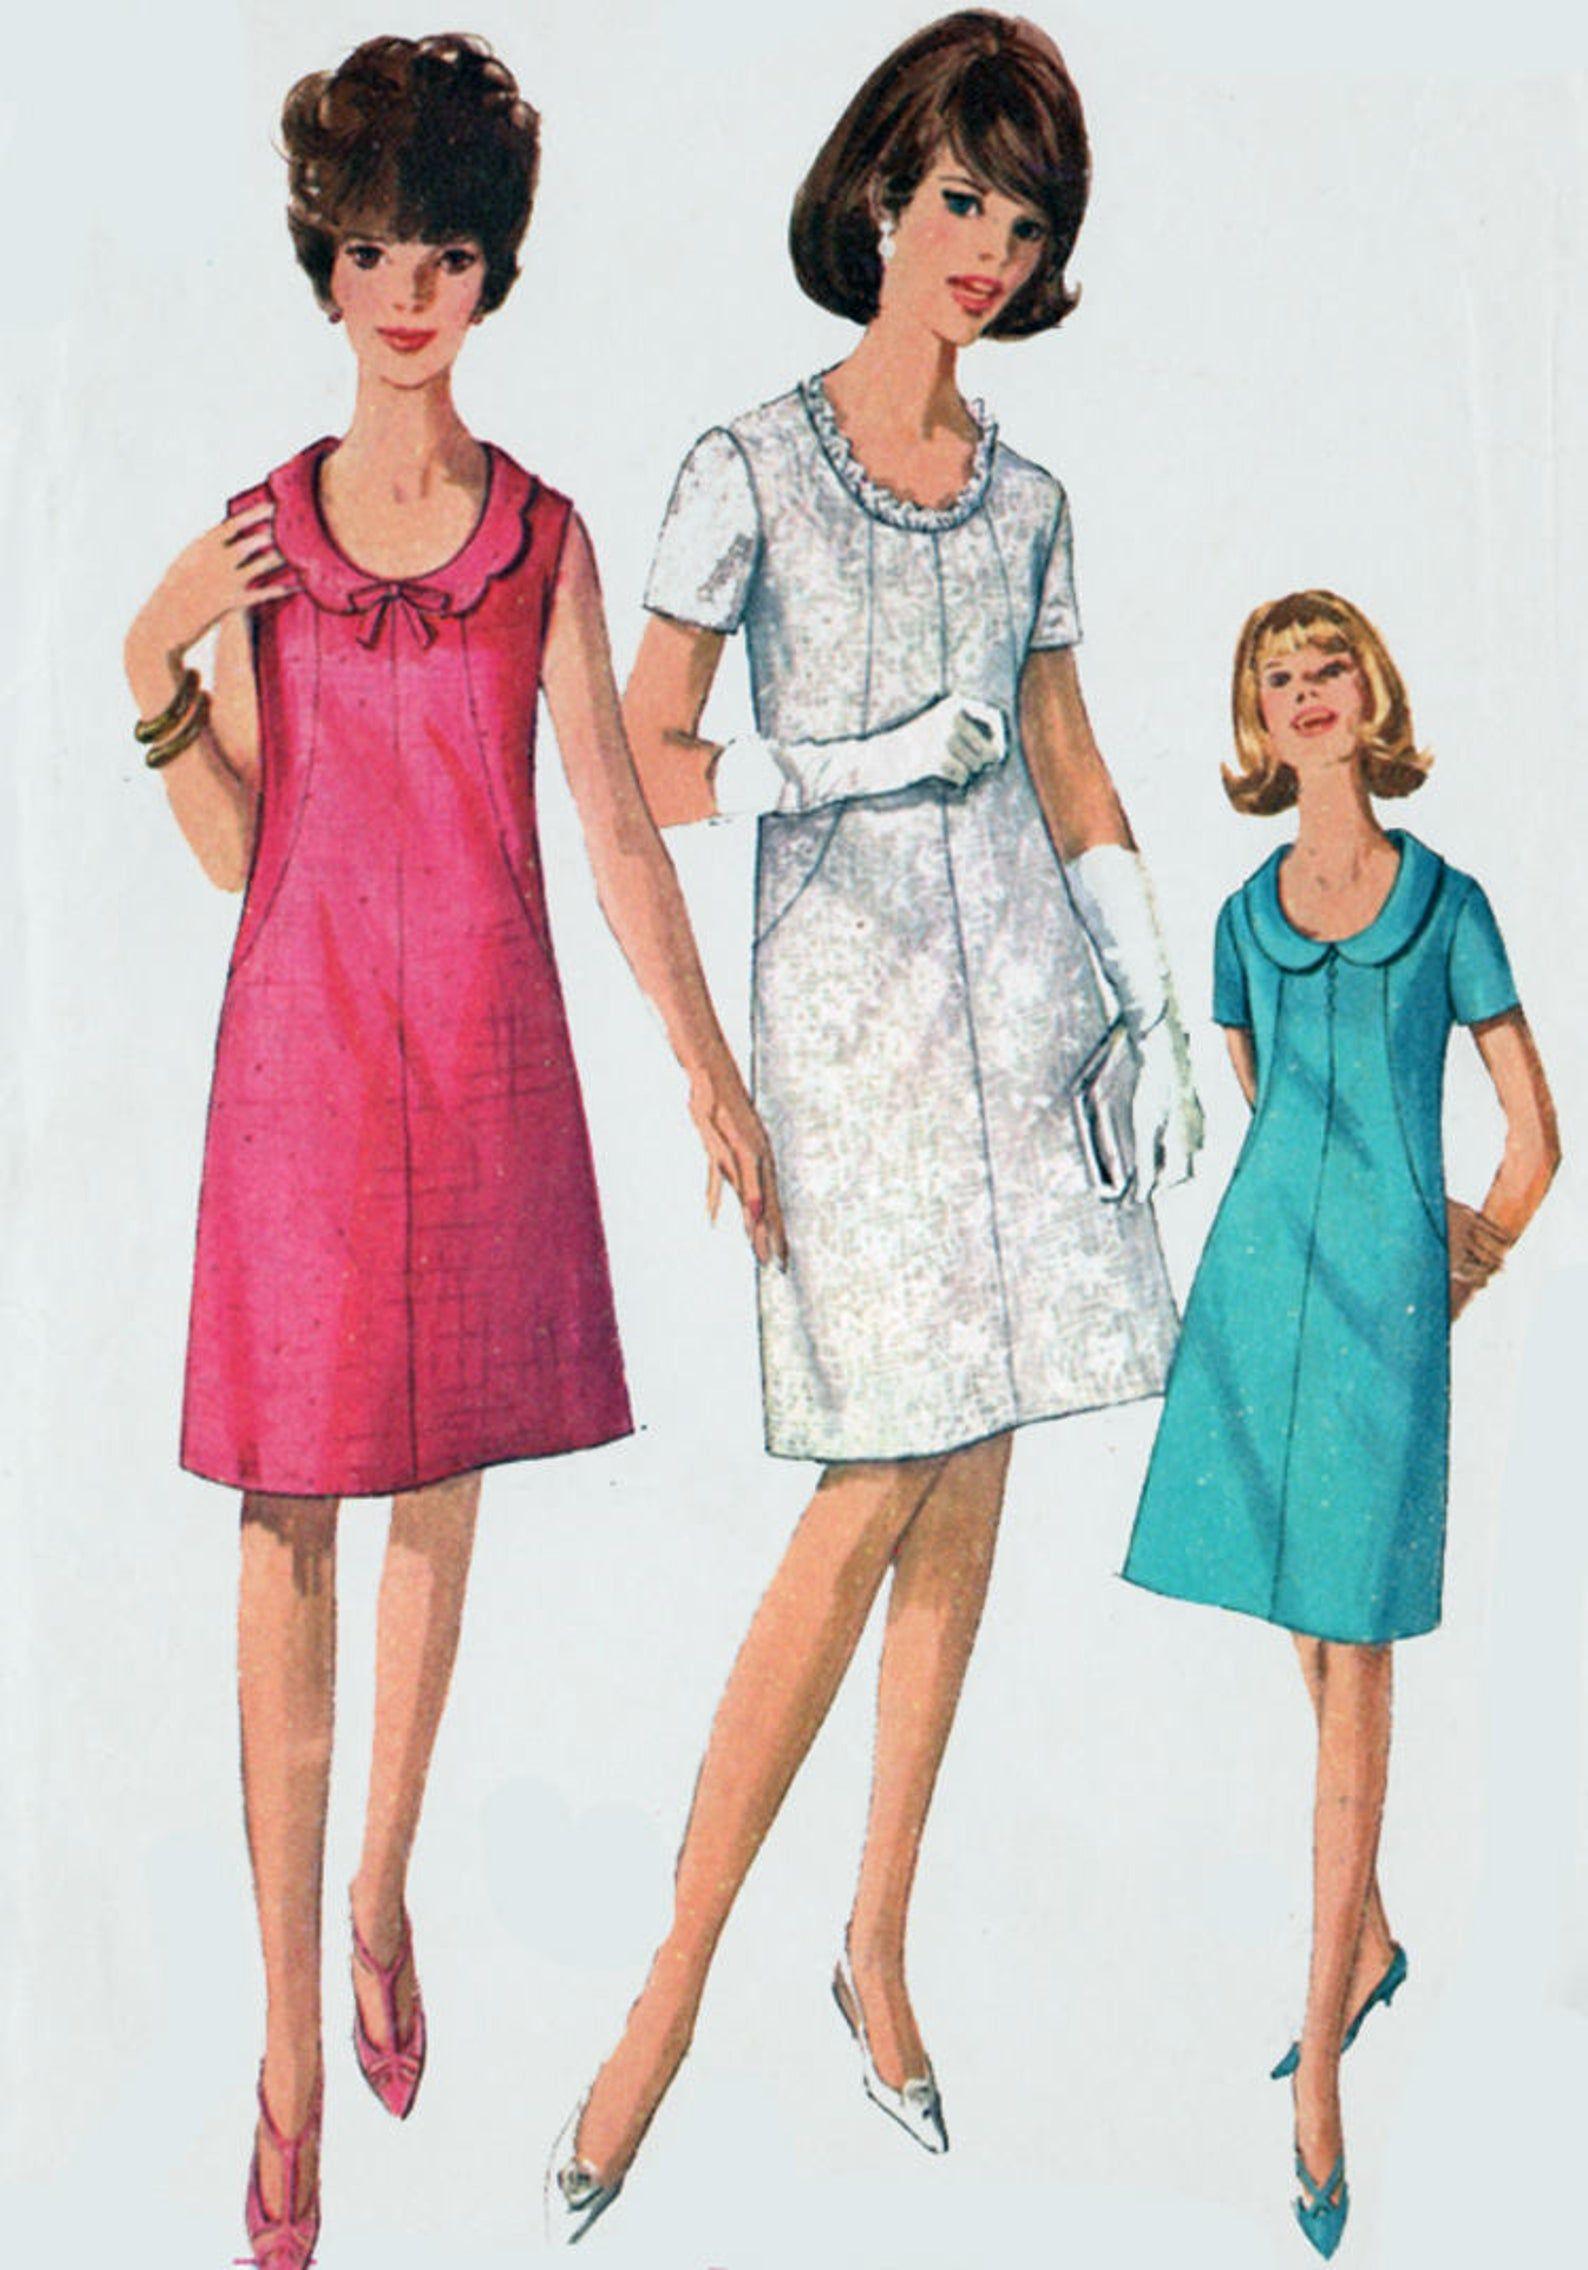 Vintage 60s Mod A Line Shift Dress With Scooped Neckline Etsy Mod Dress Pattern Sewing Pattern Sizes Shift Dress [ 2270 x 1588 Pixel ]